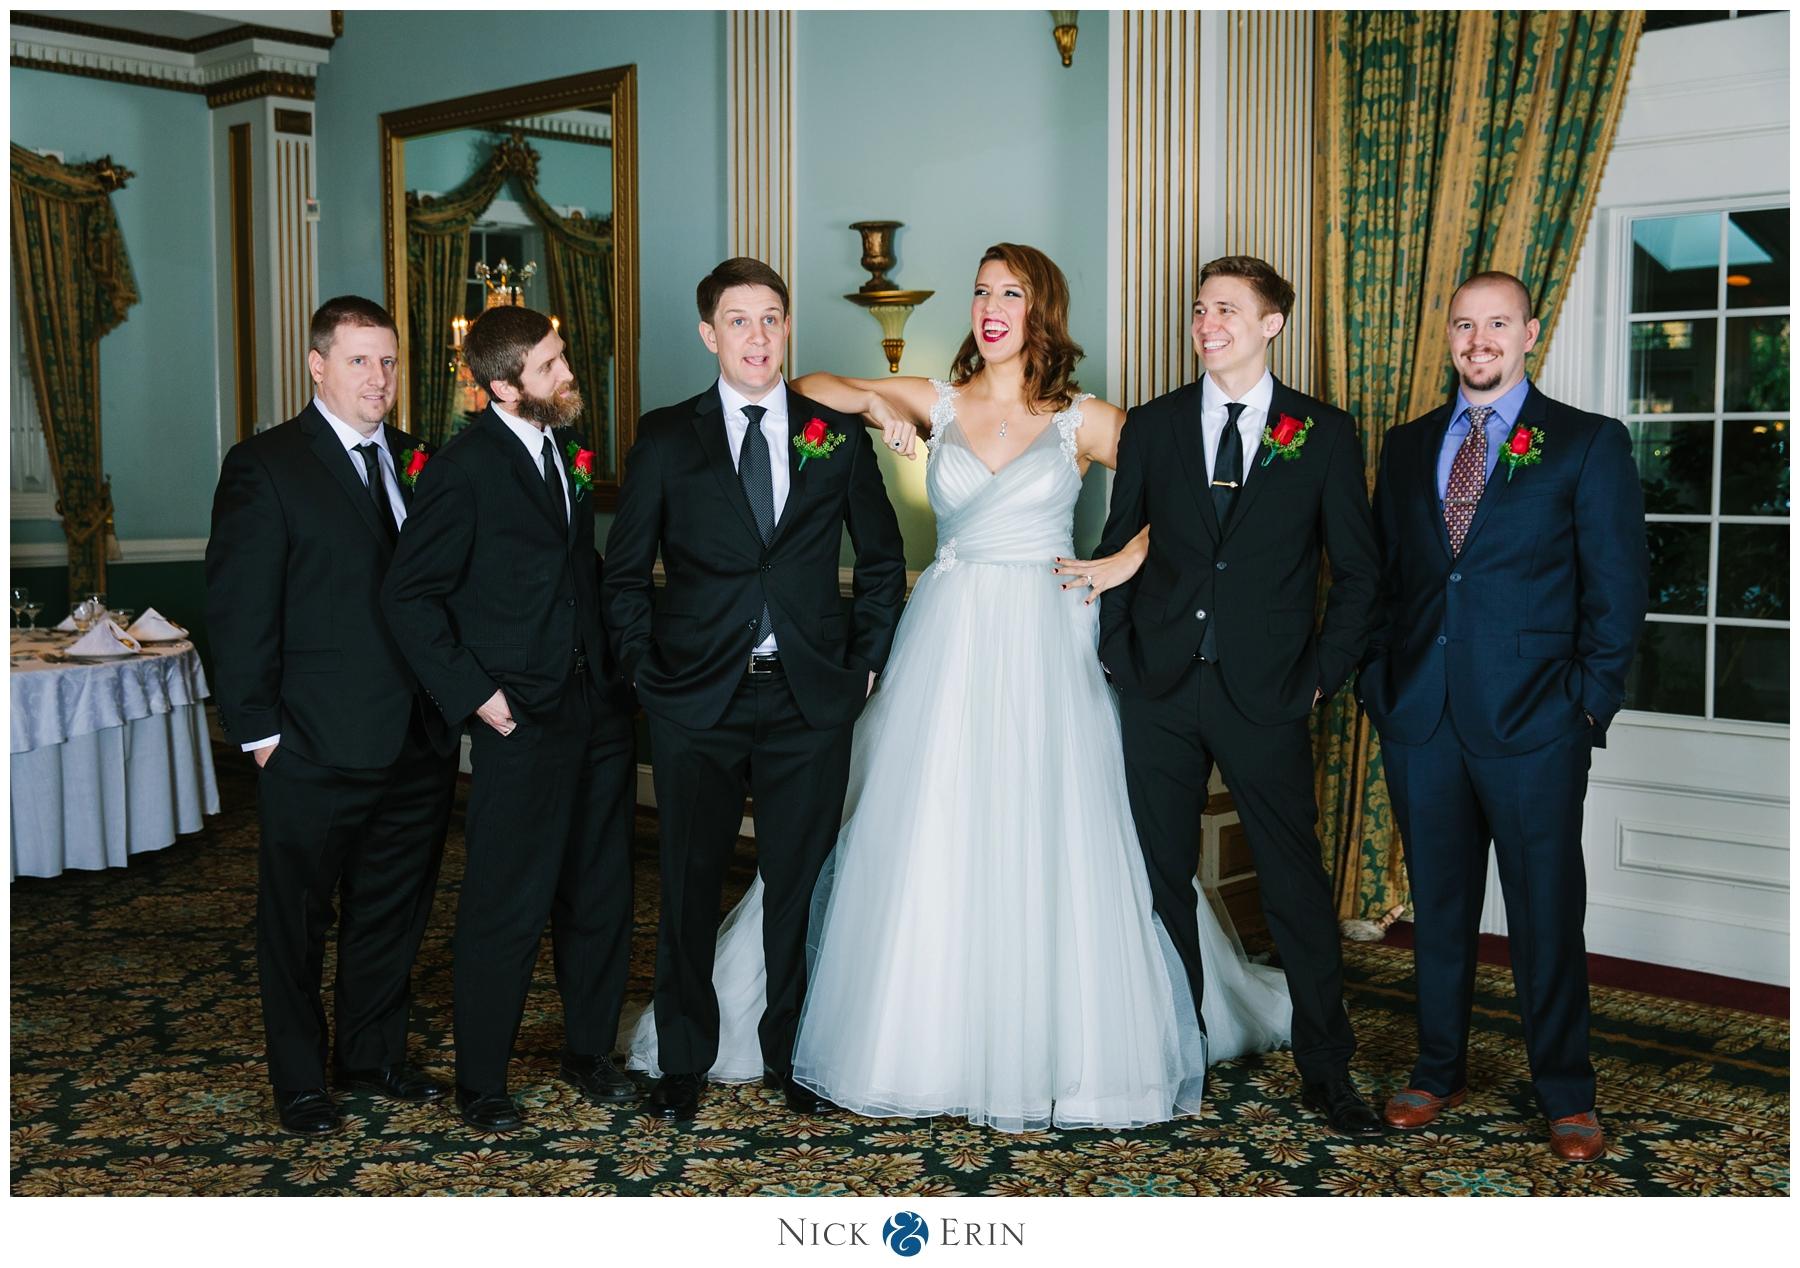 Donner_Photography_Mendenhall Inn Wedding_Blake & Kristina_0026